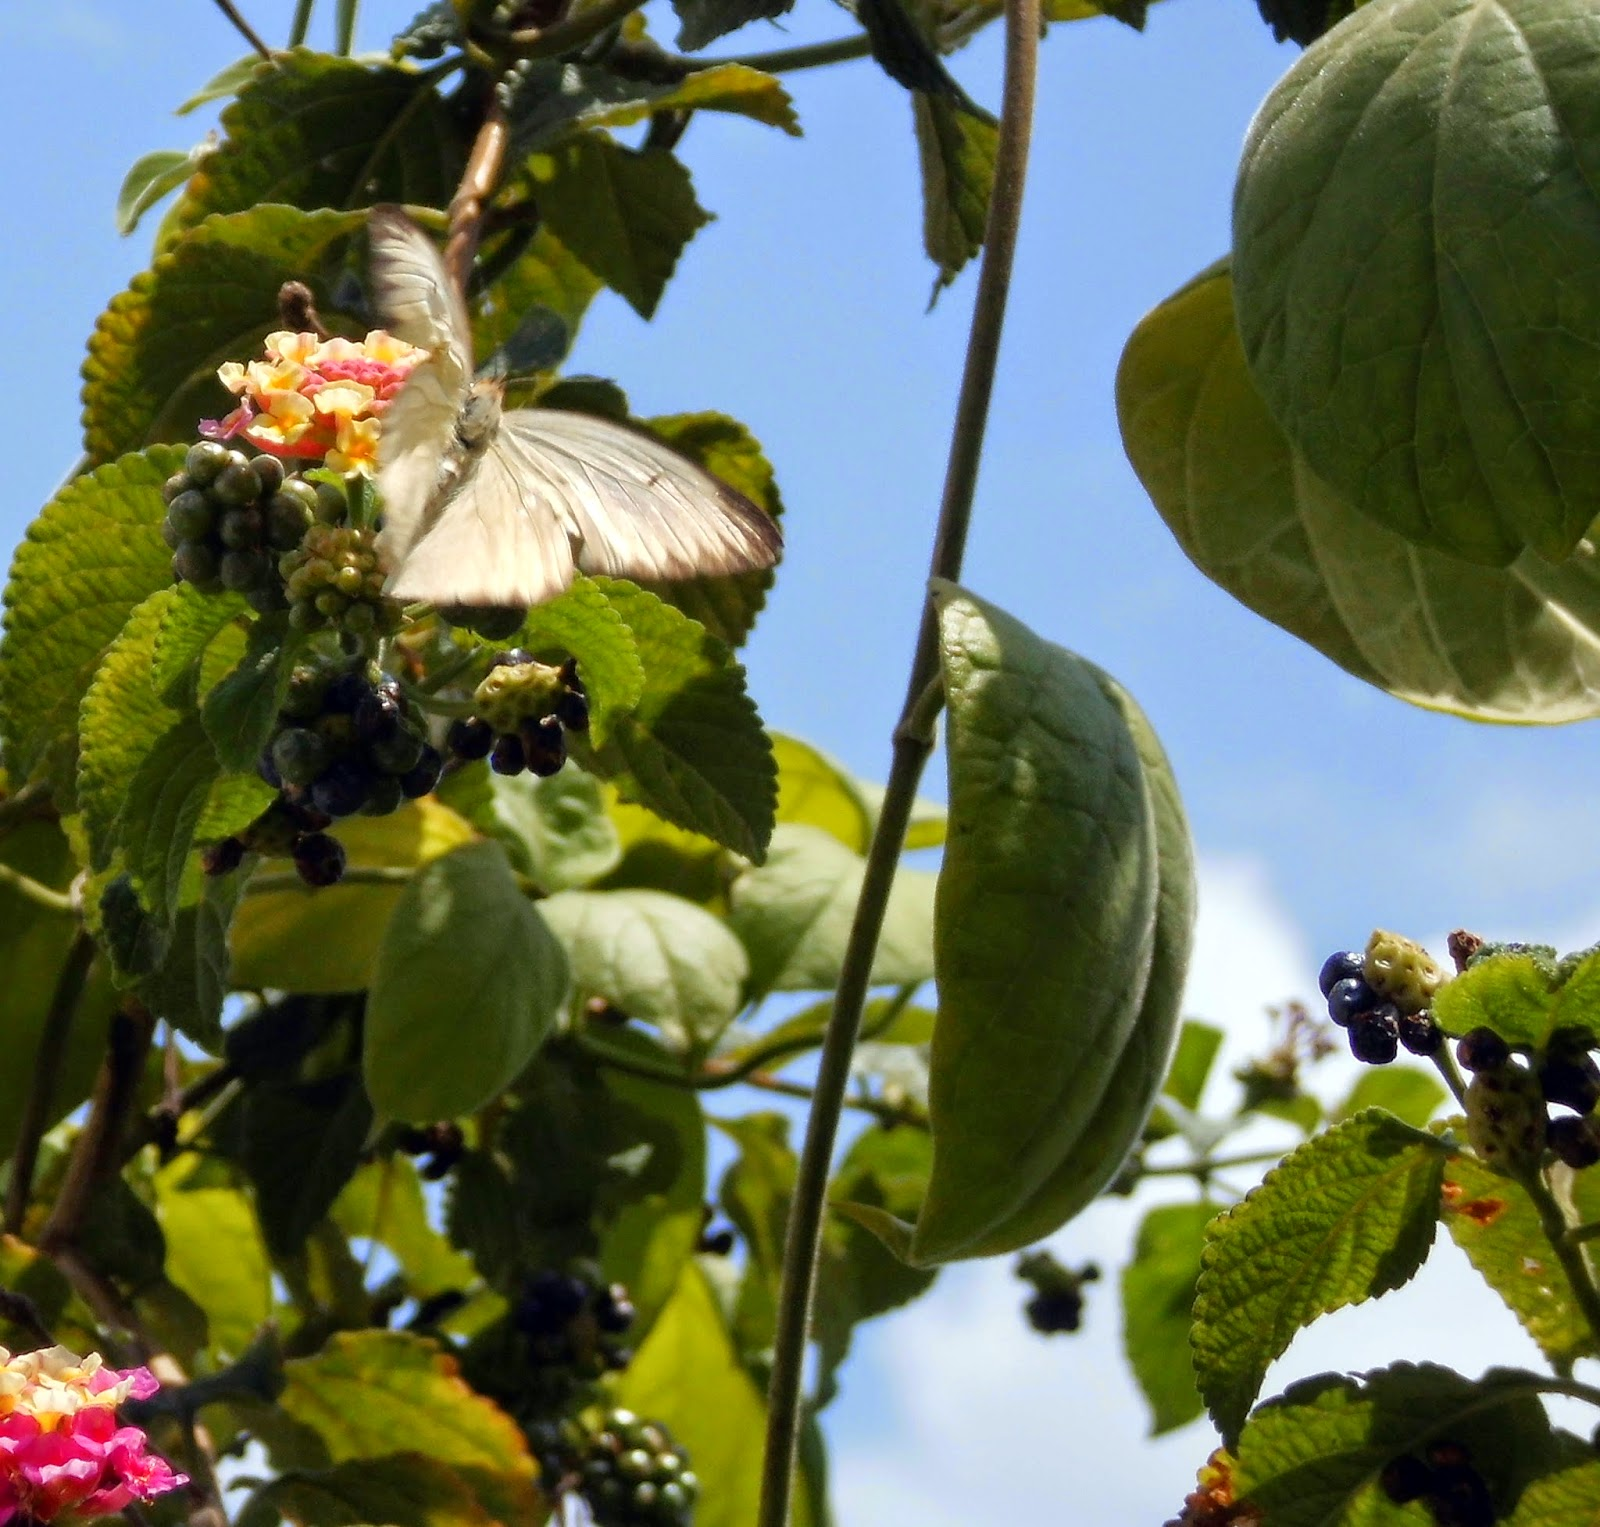 Mariposa blanca,mariposa volando, mariposa posada, mariposa en las flores